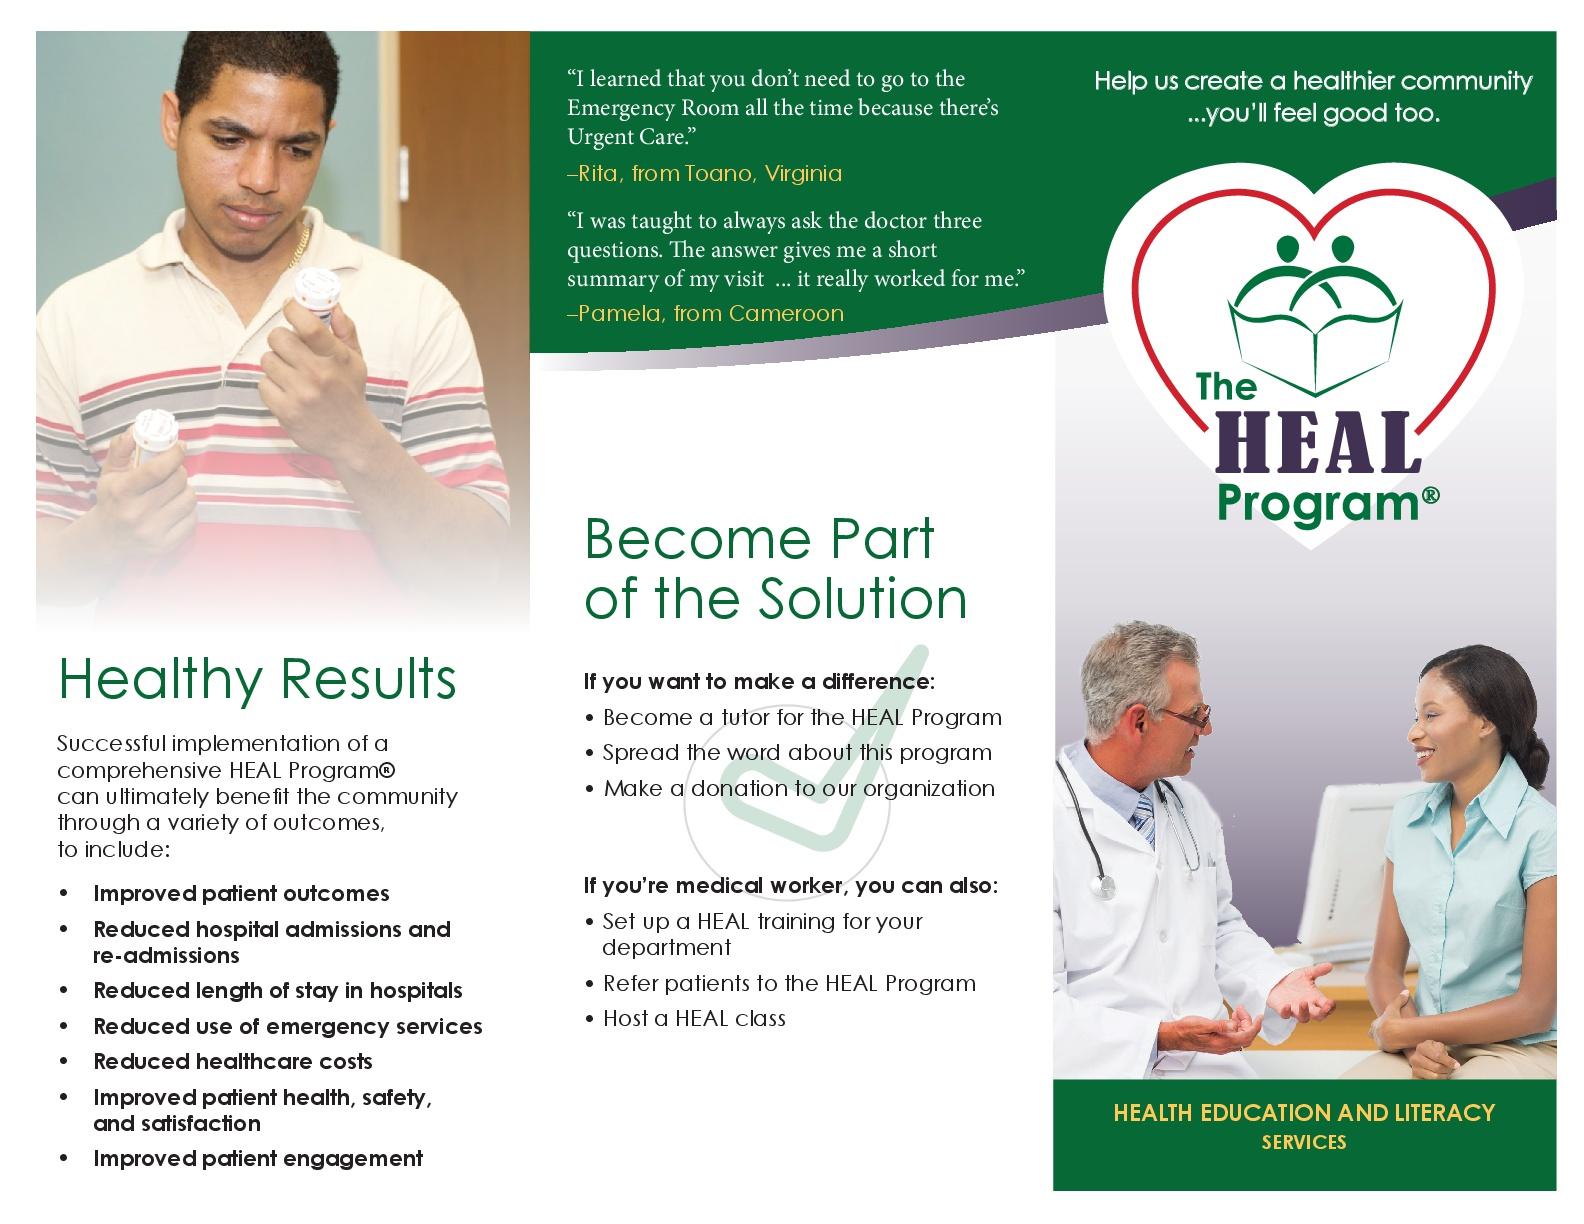 HEAL-brochure-generic,-for-desktop-printing-(1)-001.jpg